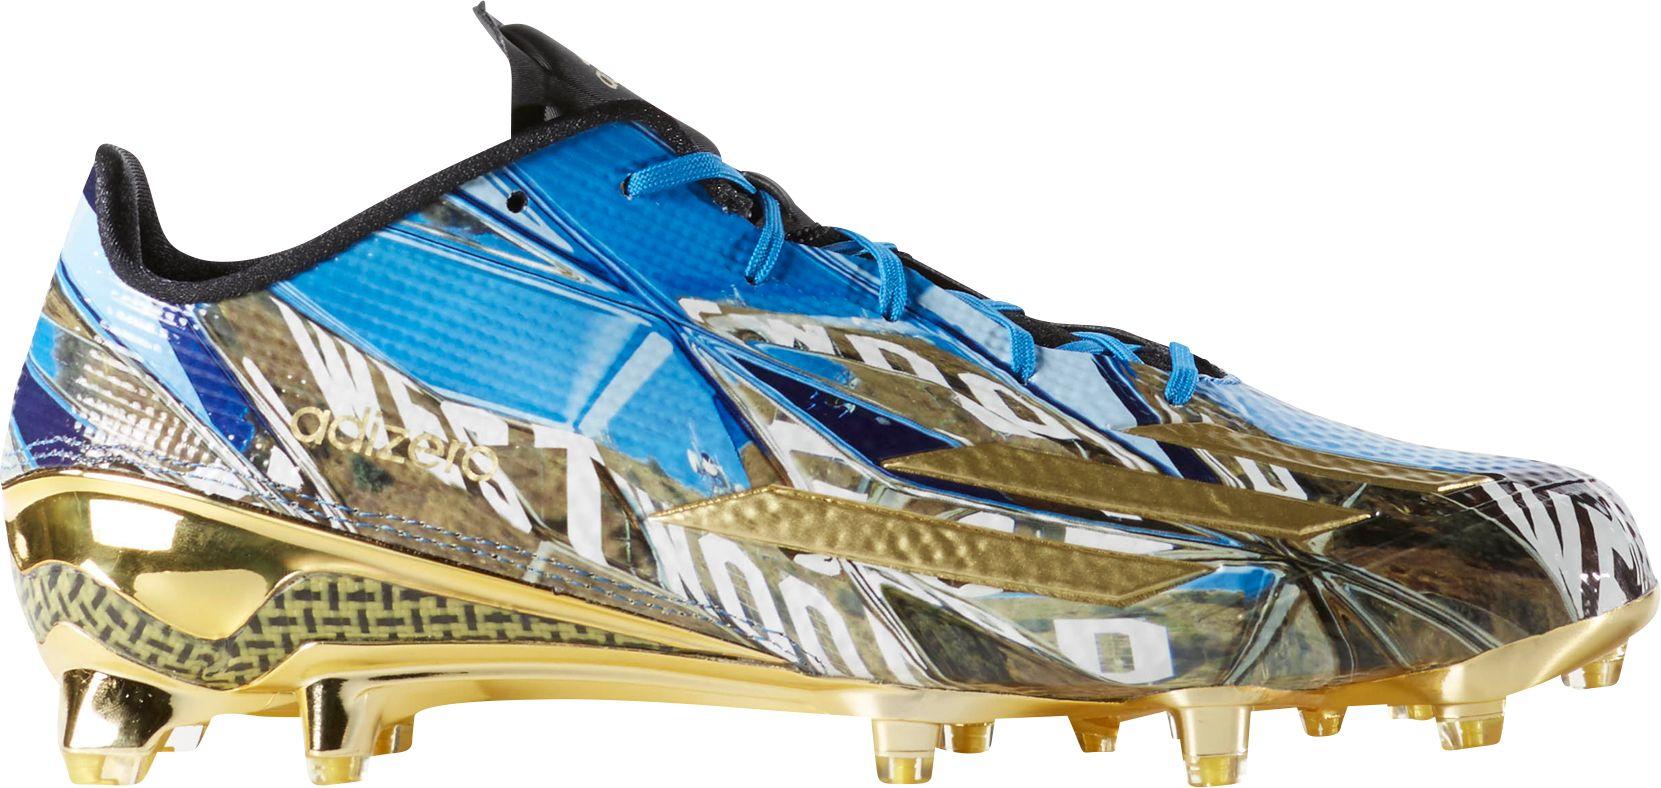 adidas football cleats noimagefound ??? TCZFWLI